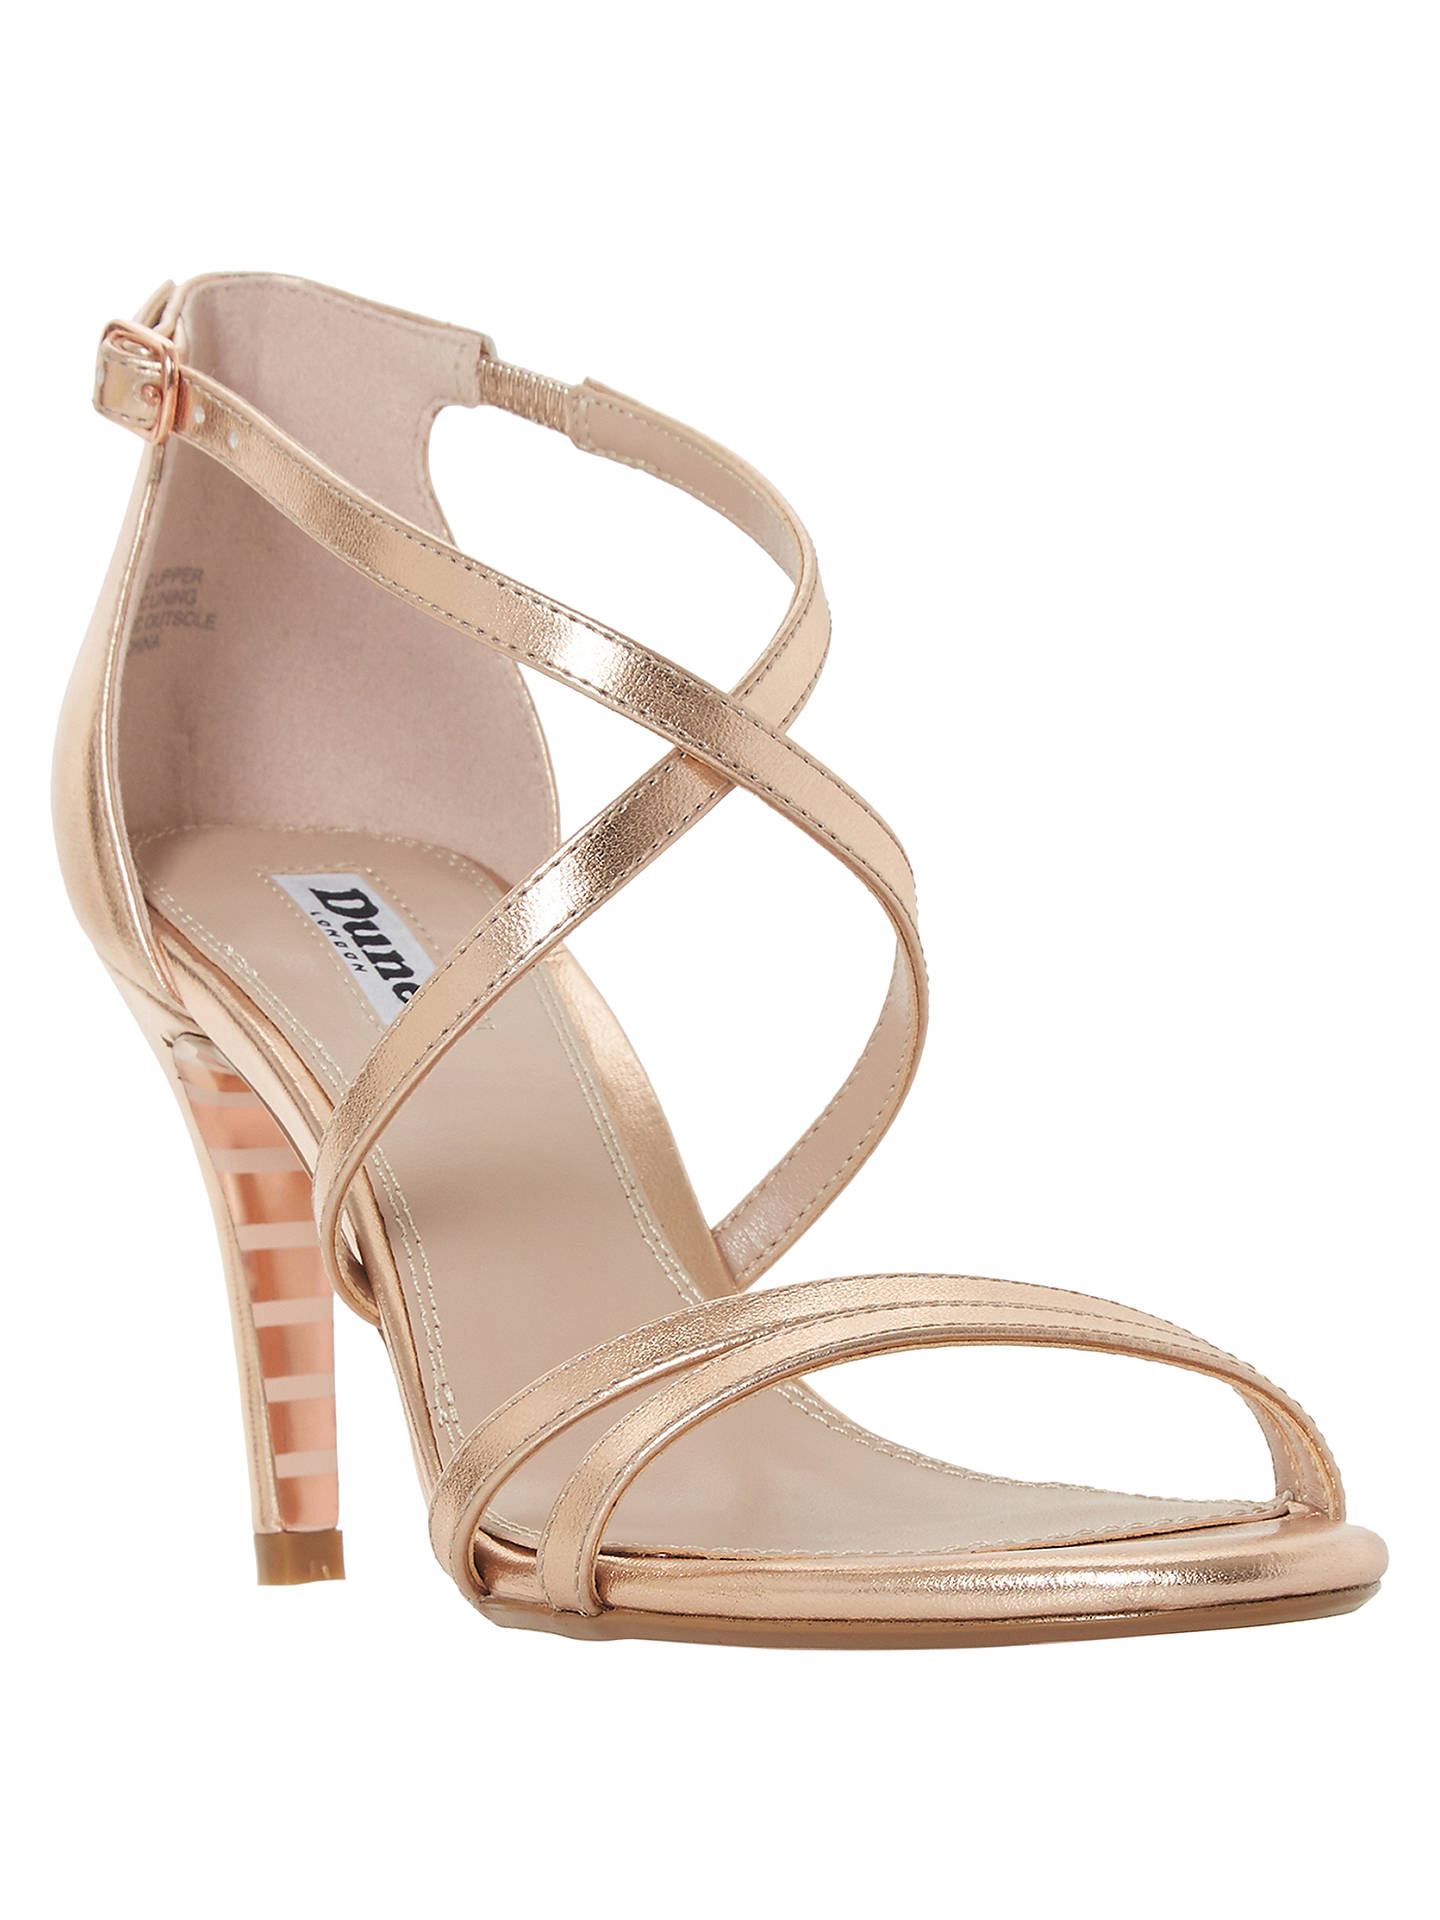 0d04415bc25d ... Buy Dune Mariela Cross Strap Stiletto Heeled Sandals